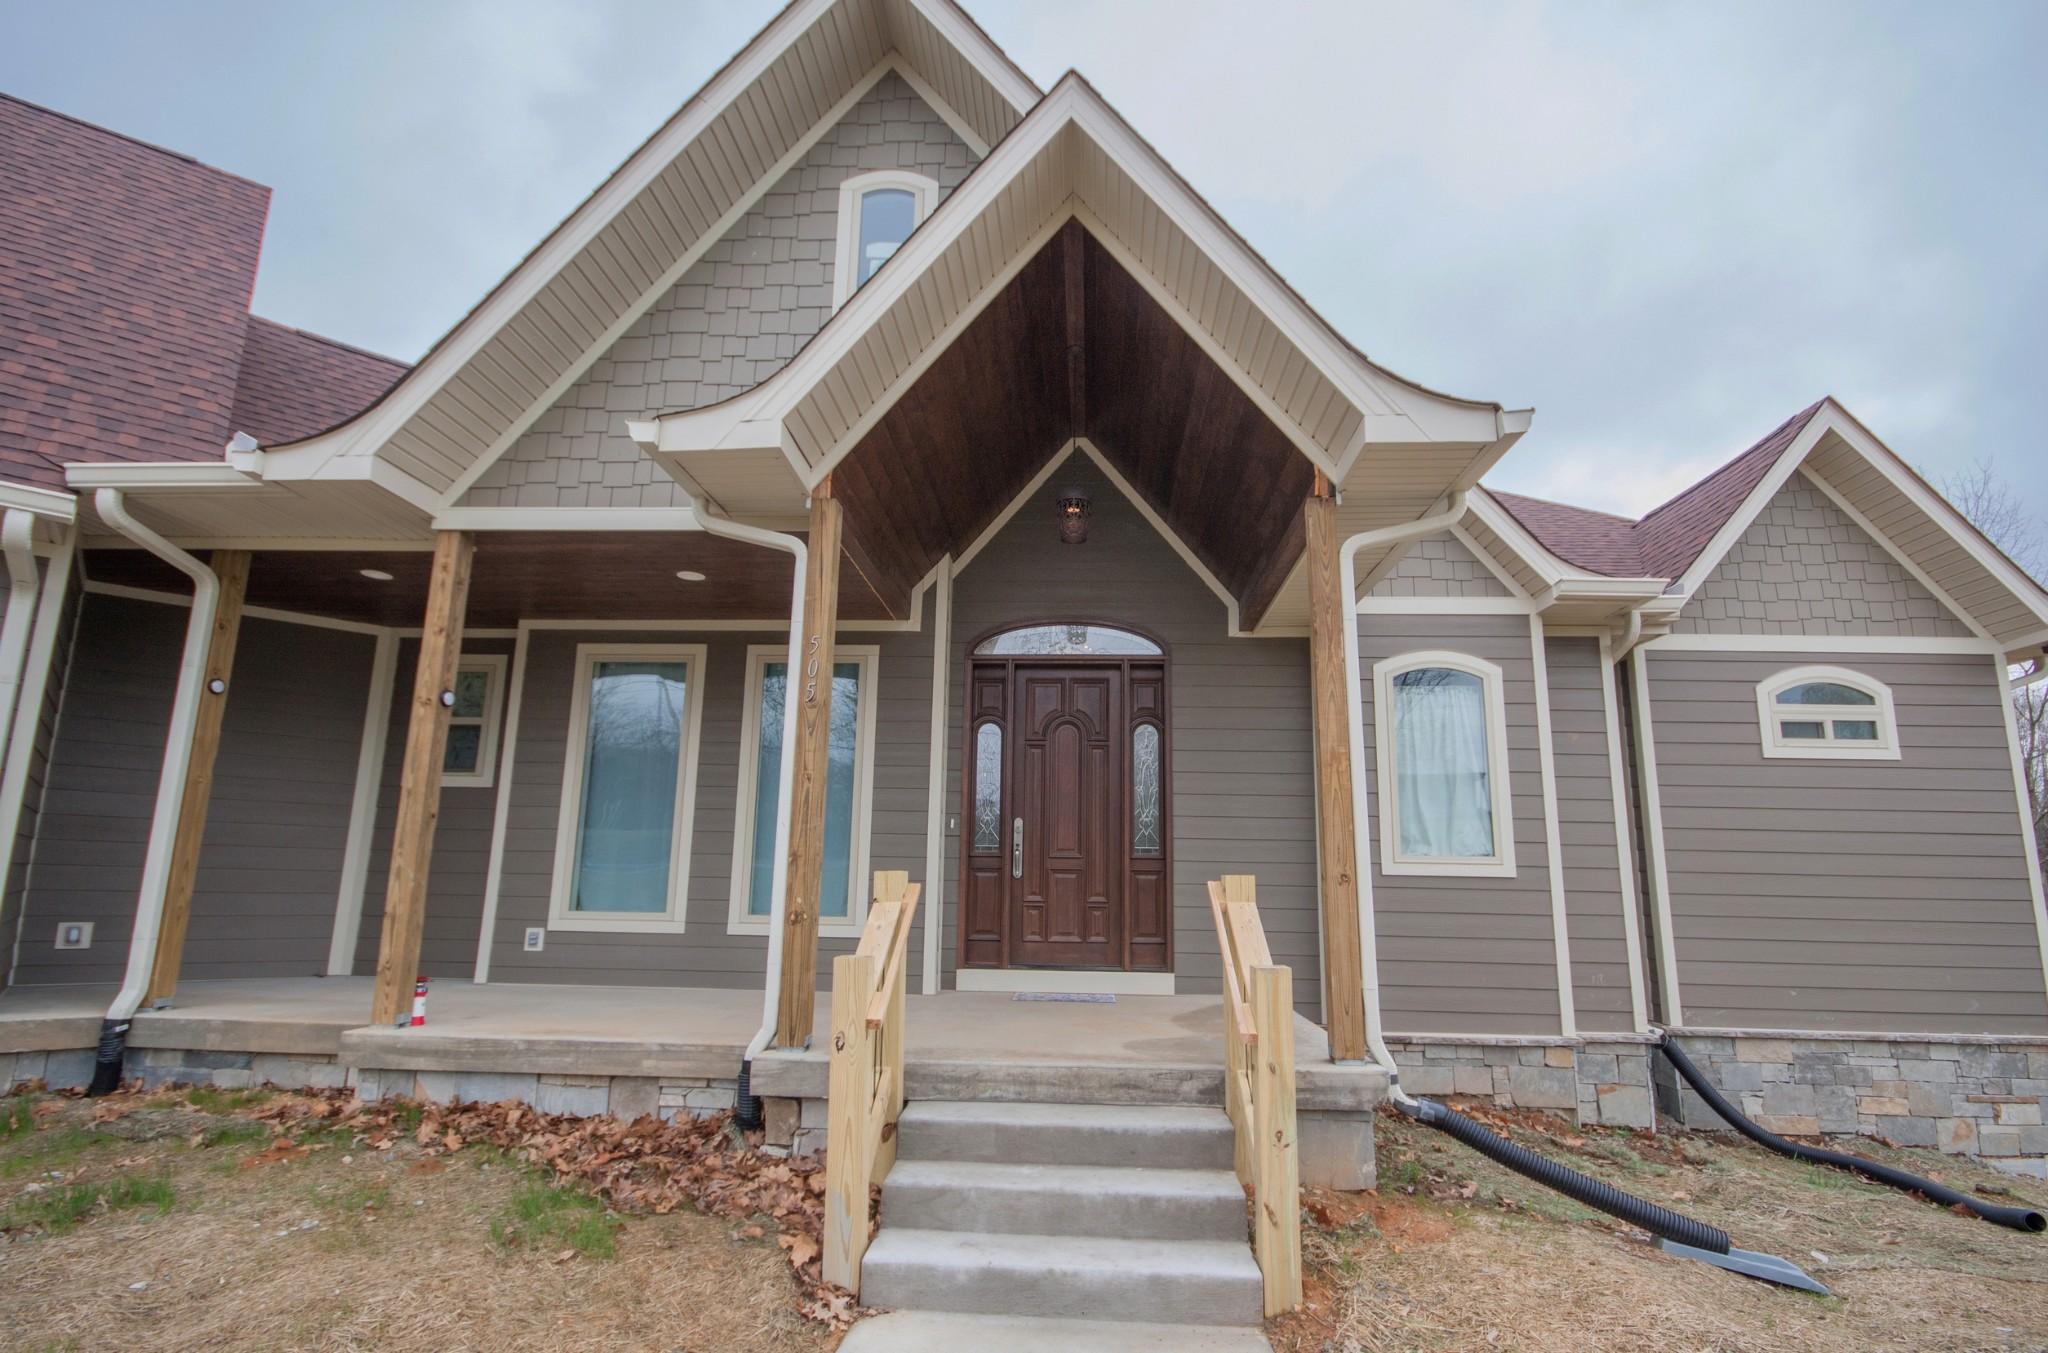 505 Calista Rd, White House, TN 37188 - White House, TN real estate listing